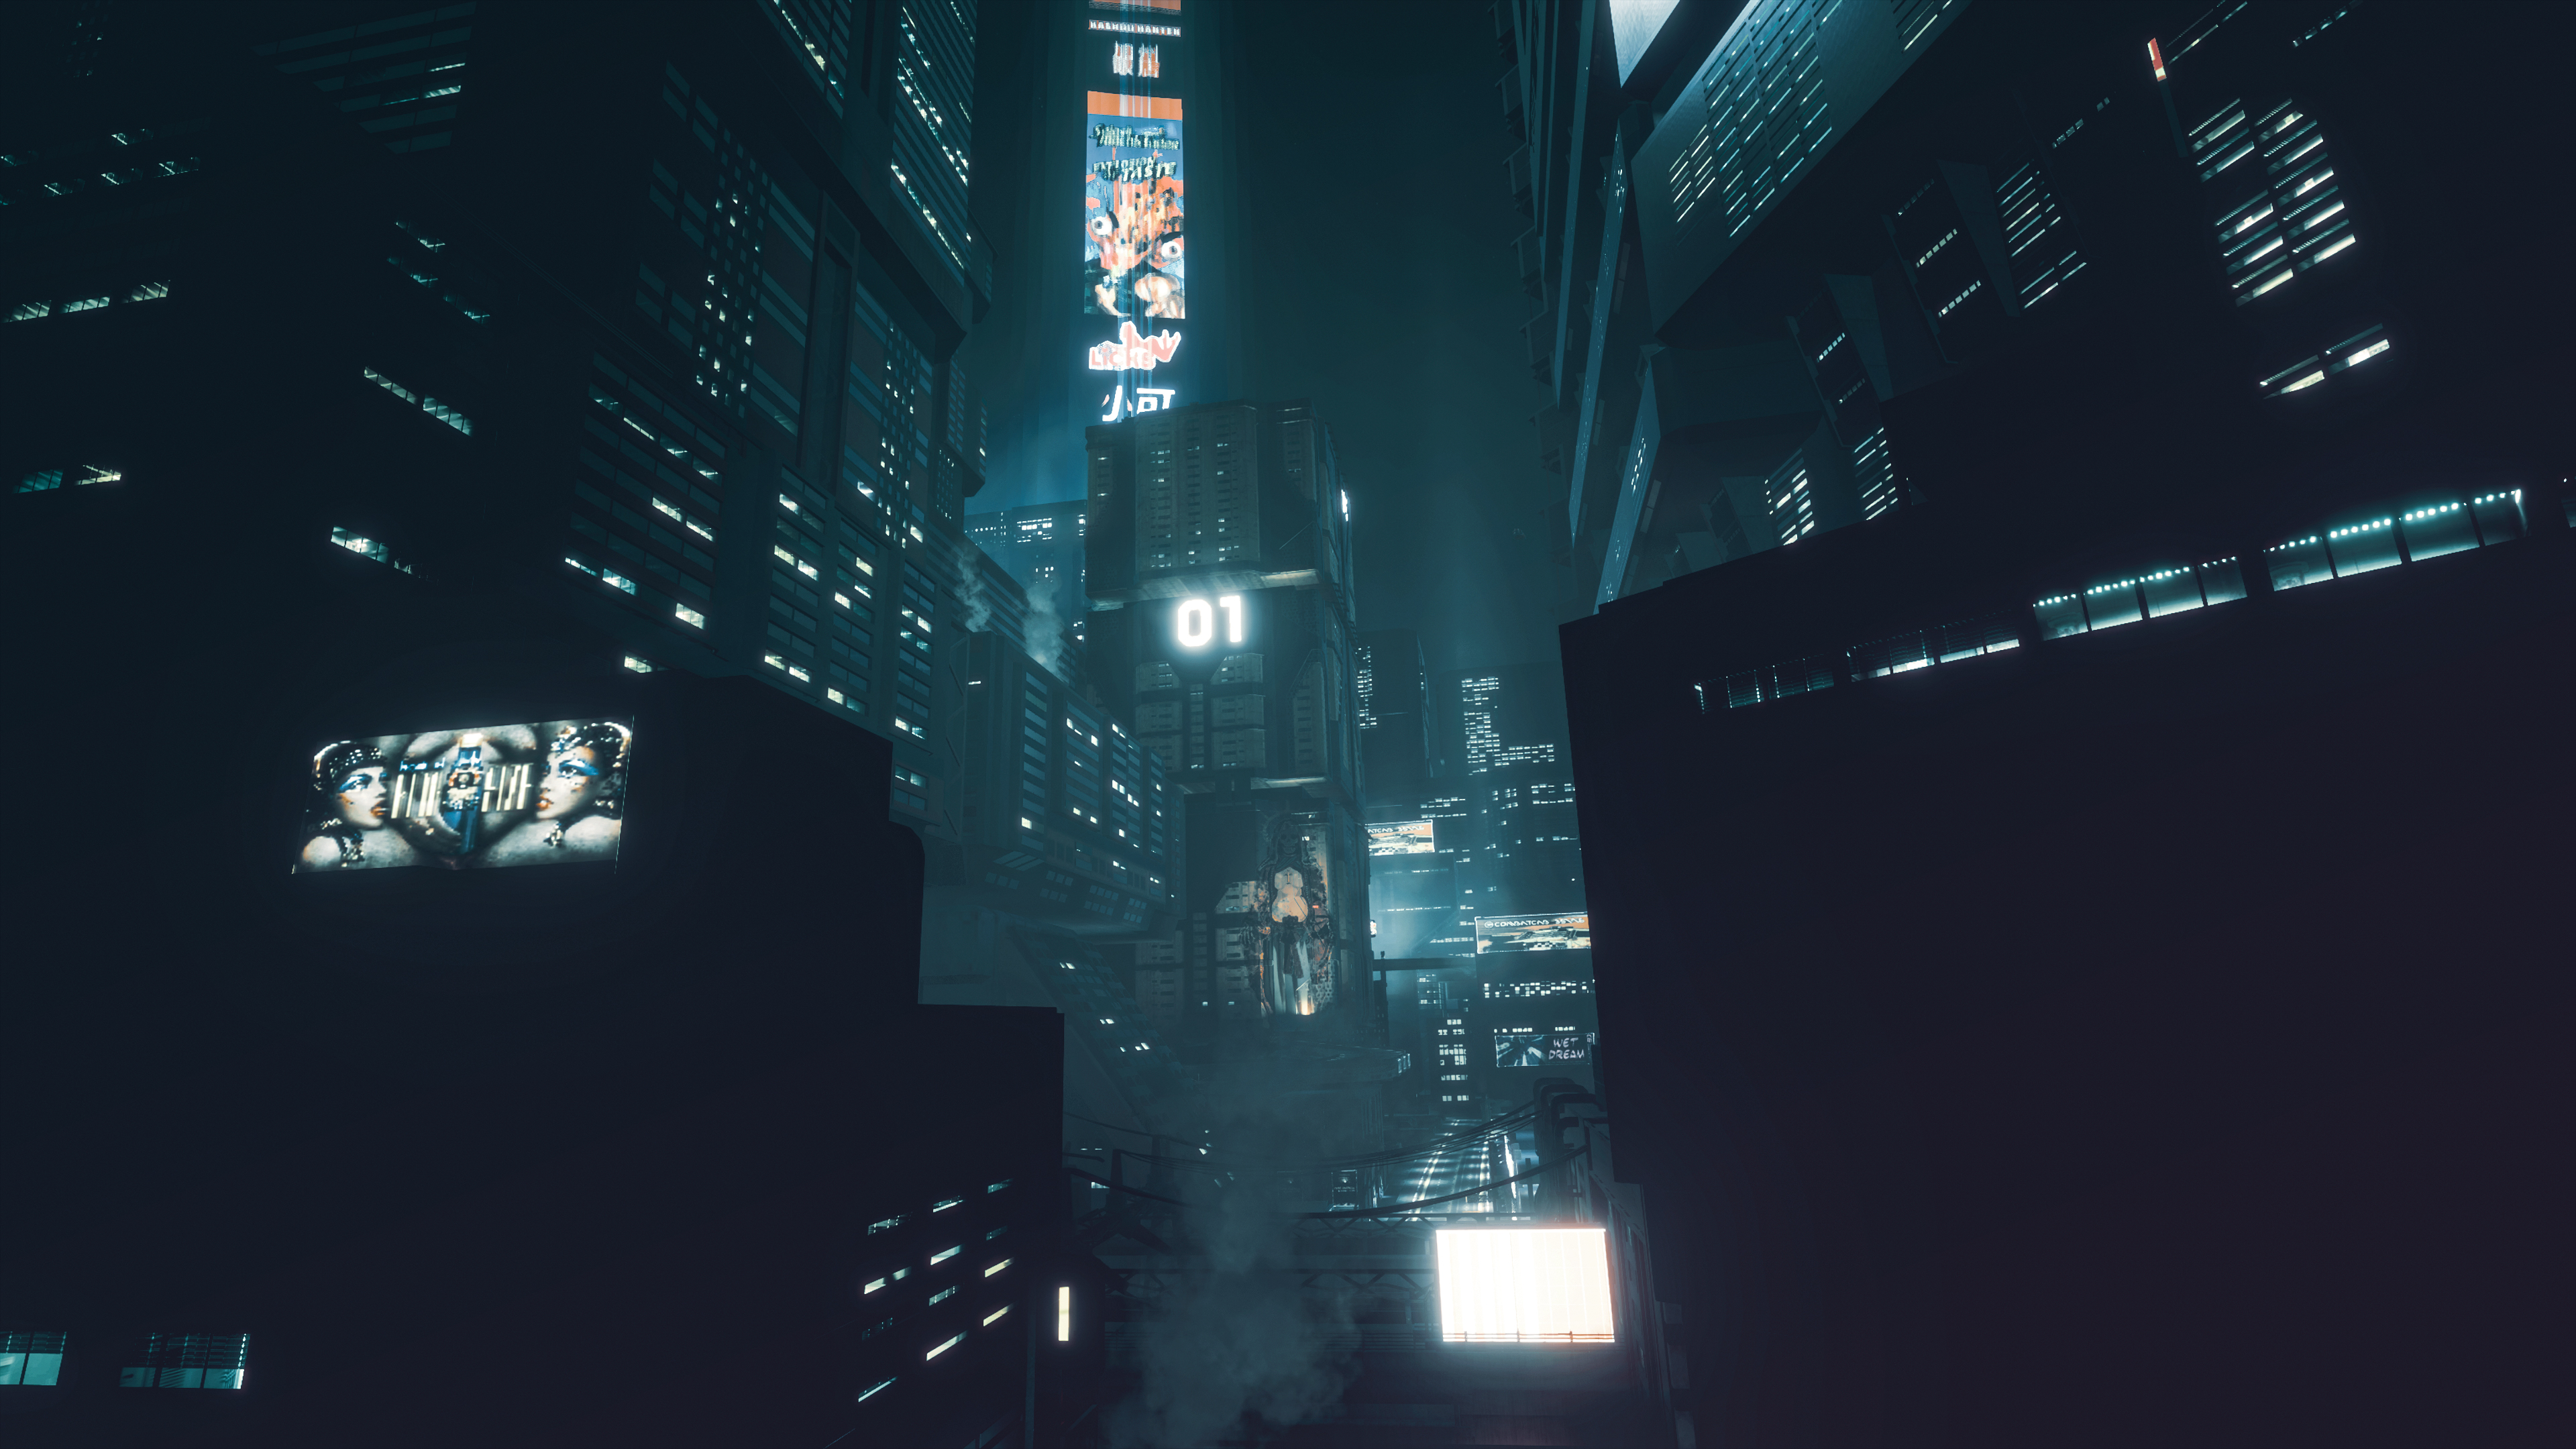 General 3840x2160 Cyberpunk 2077 PC gaming video games